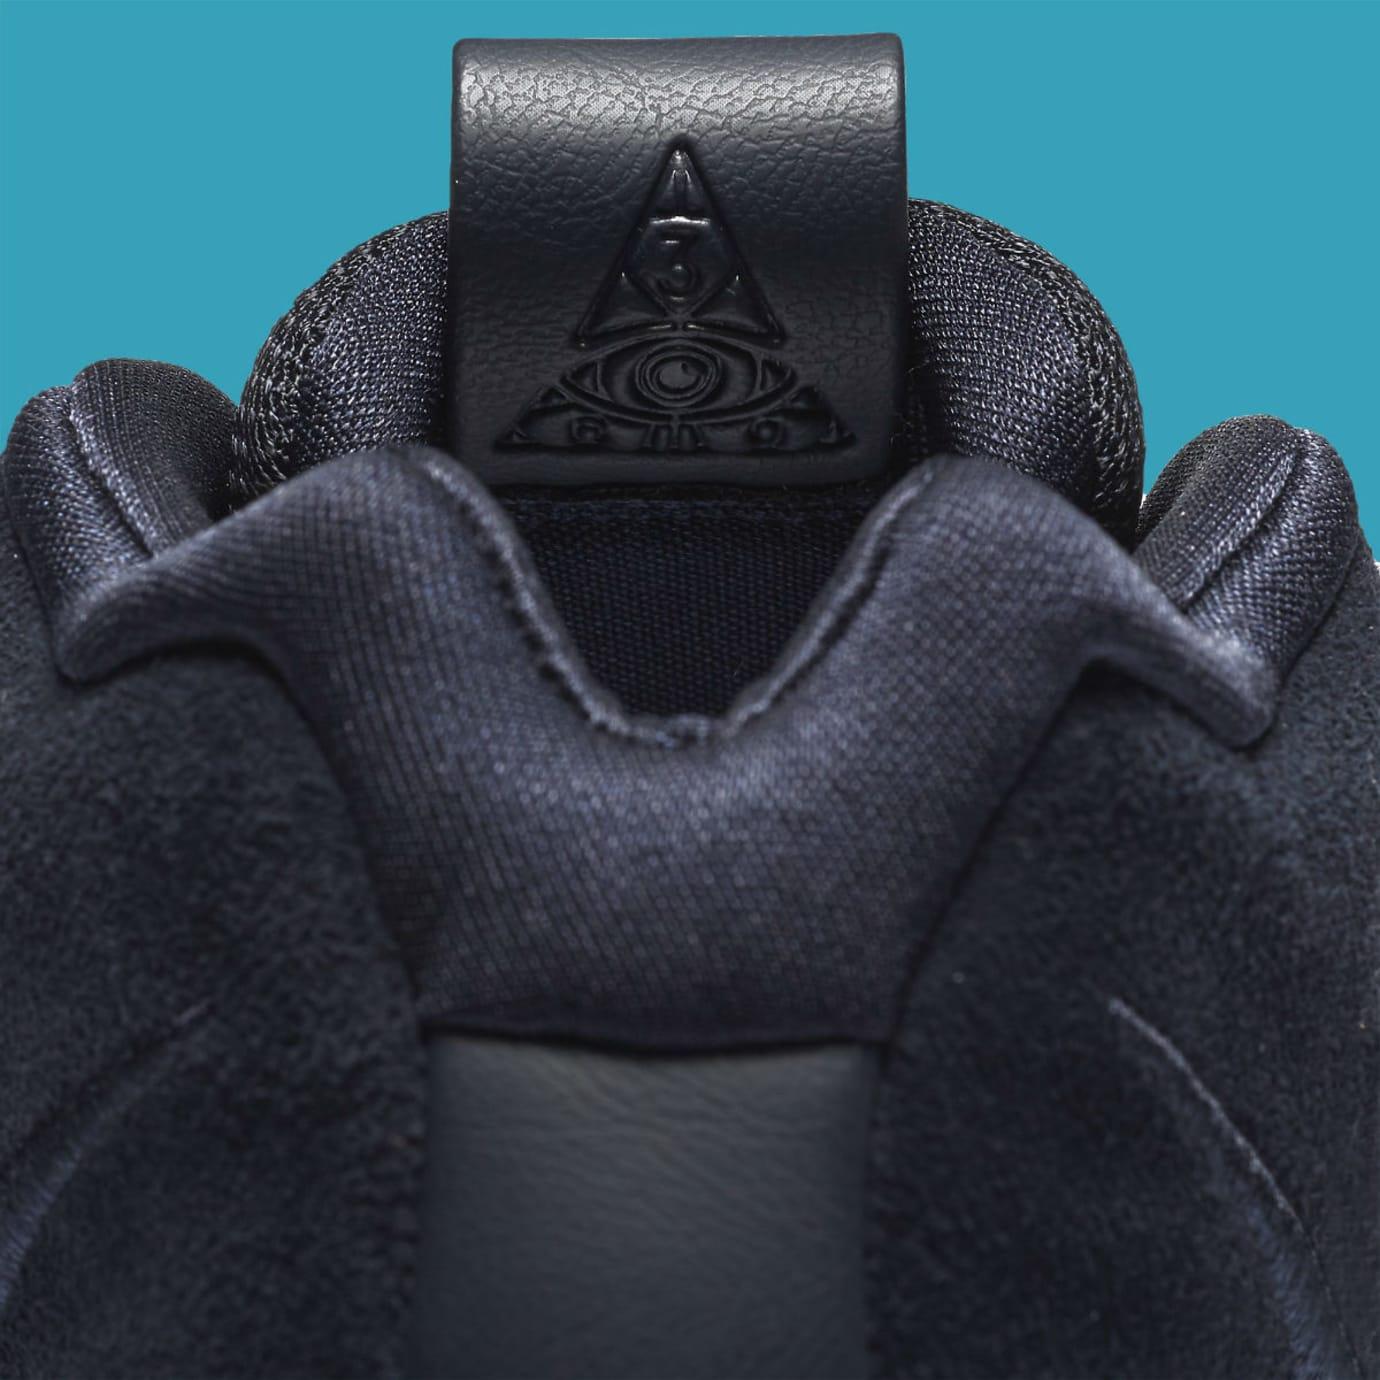 Nike Kyrie 4 Dark Obsidian Release Date 943806-401 Tongue